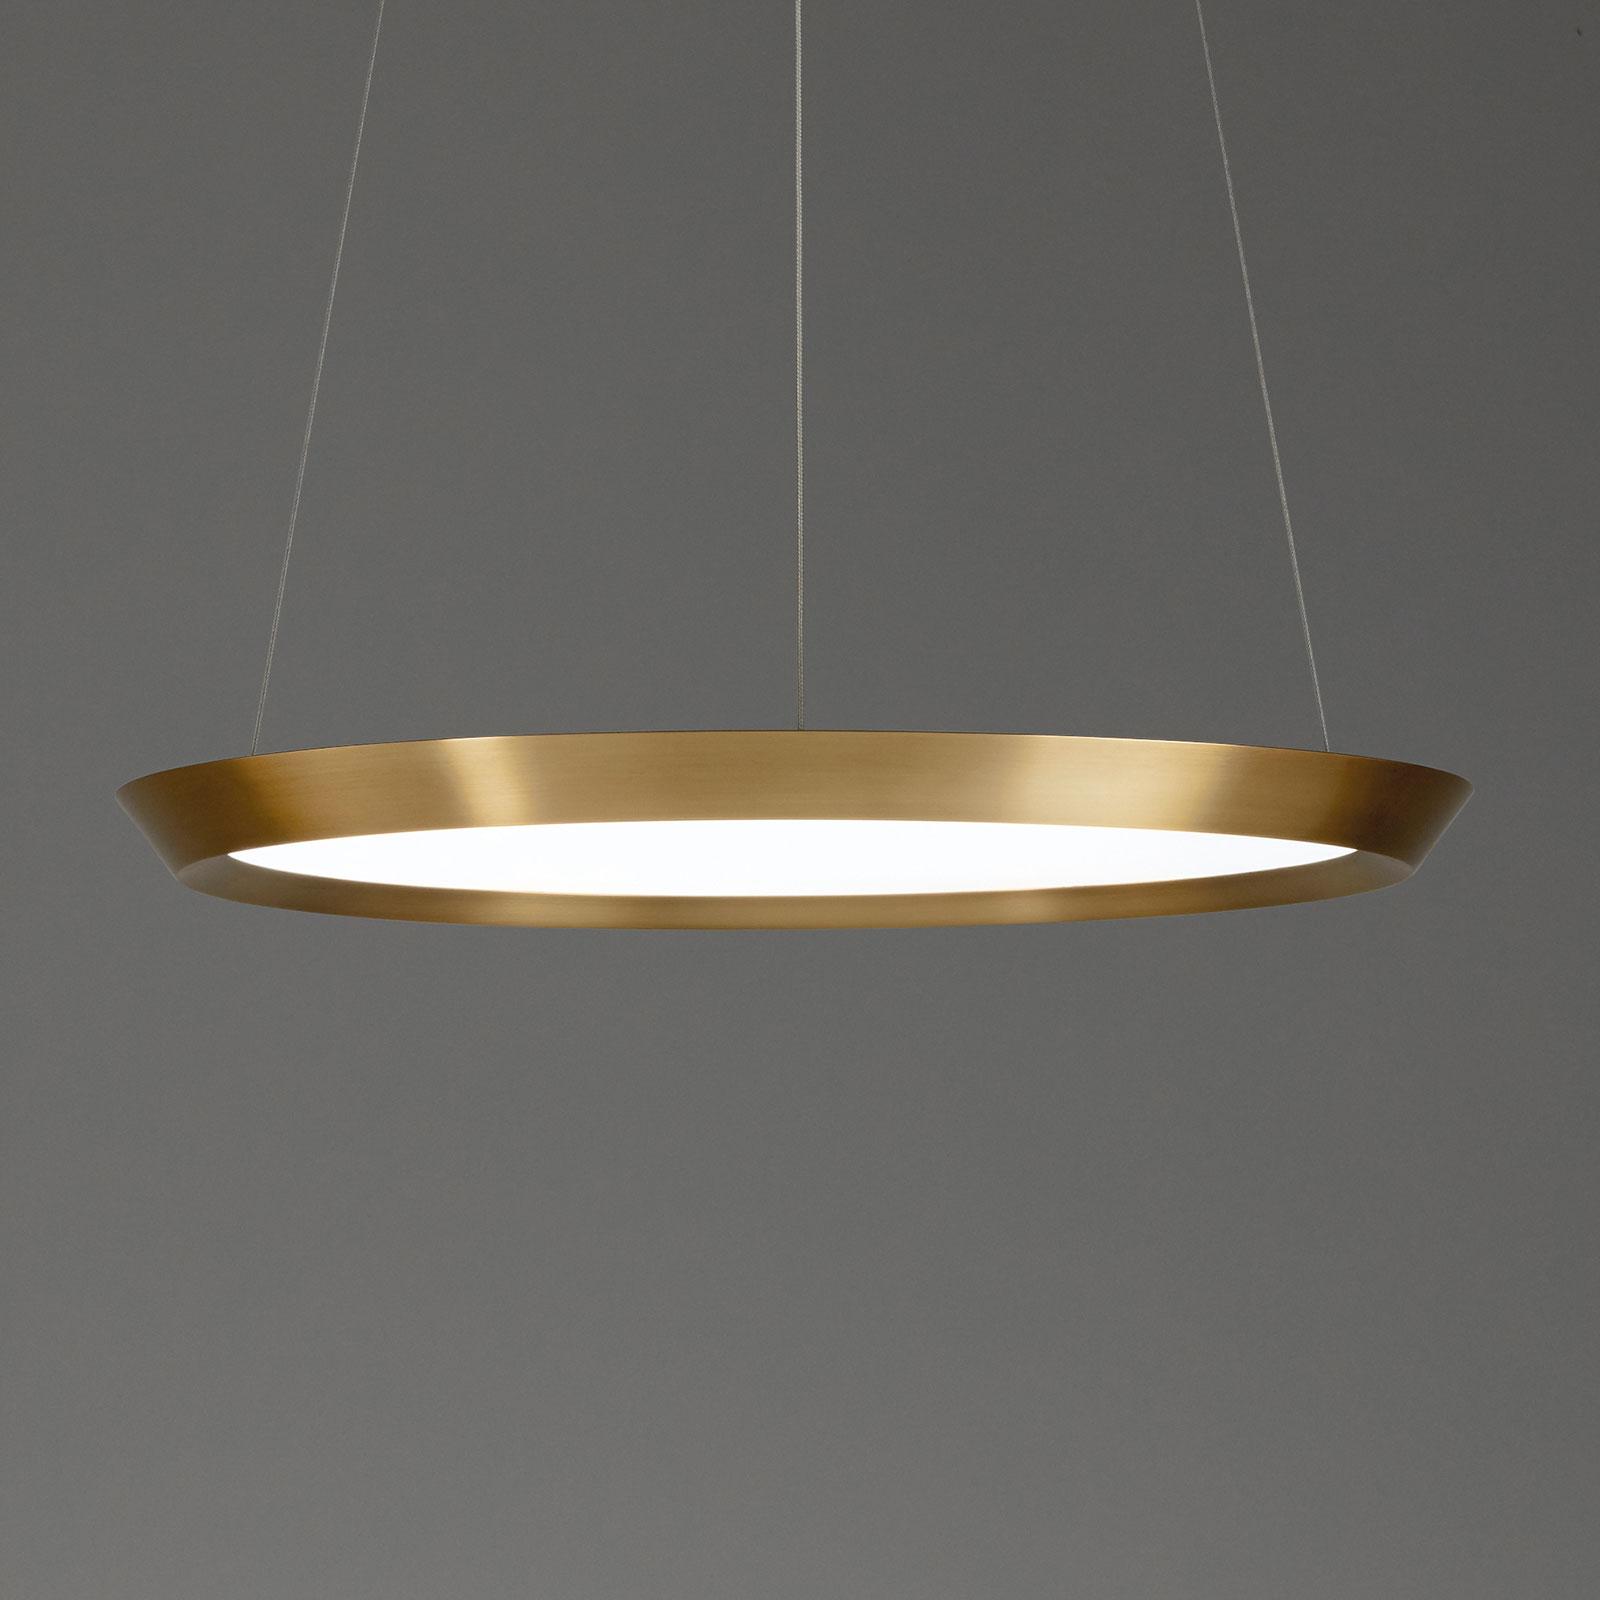 Grok Saturn lampa wisząca LED mosiężna, Ø 60 cm